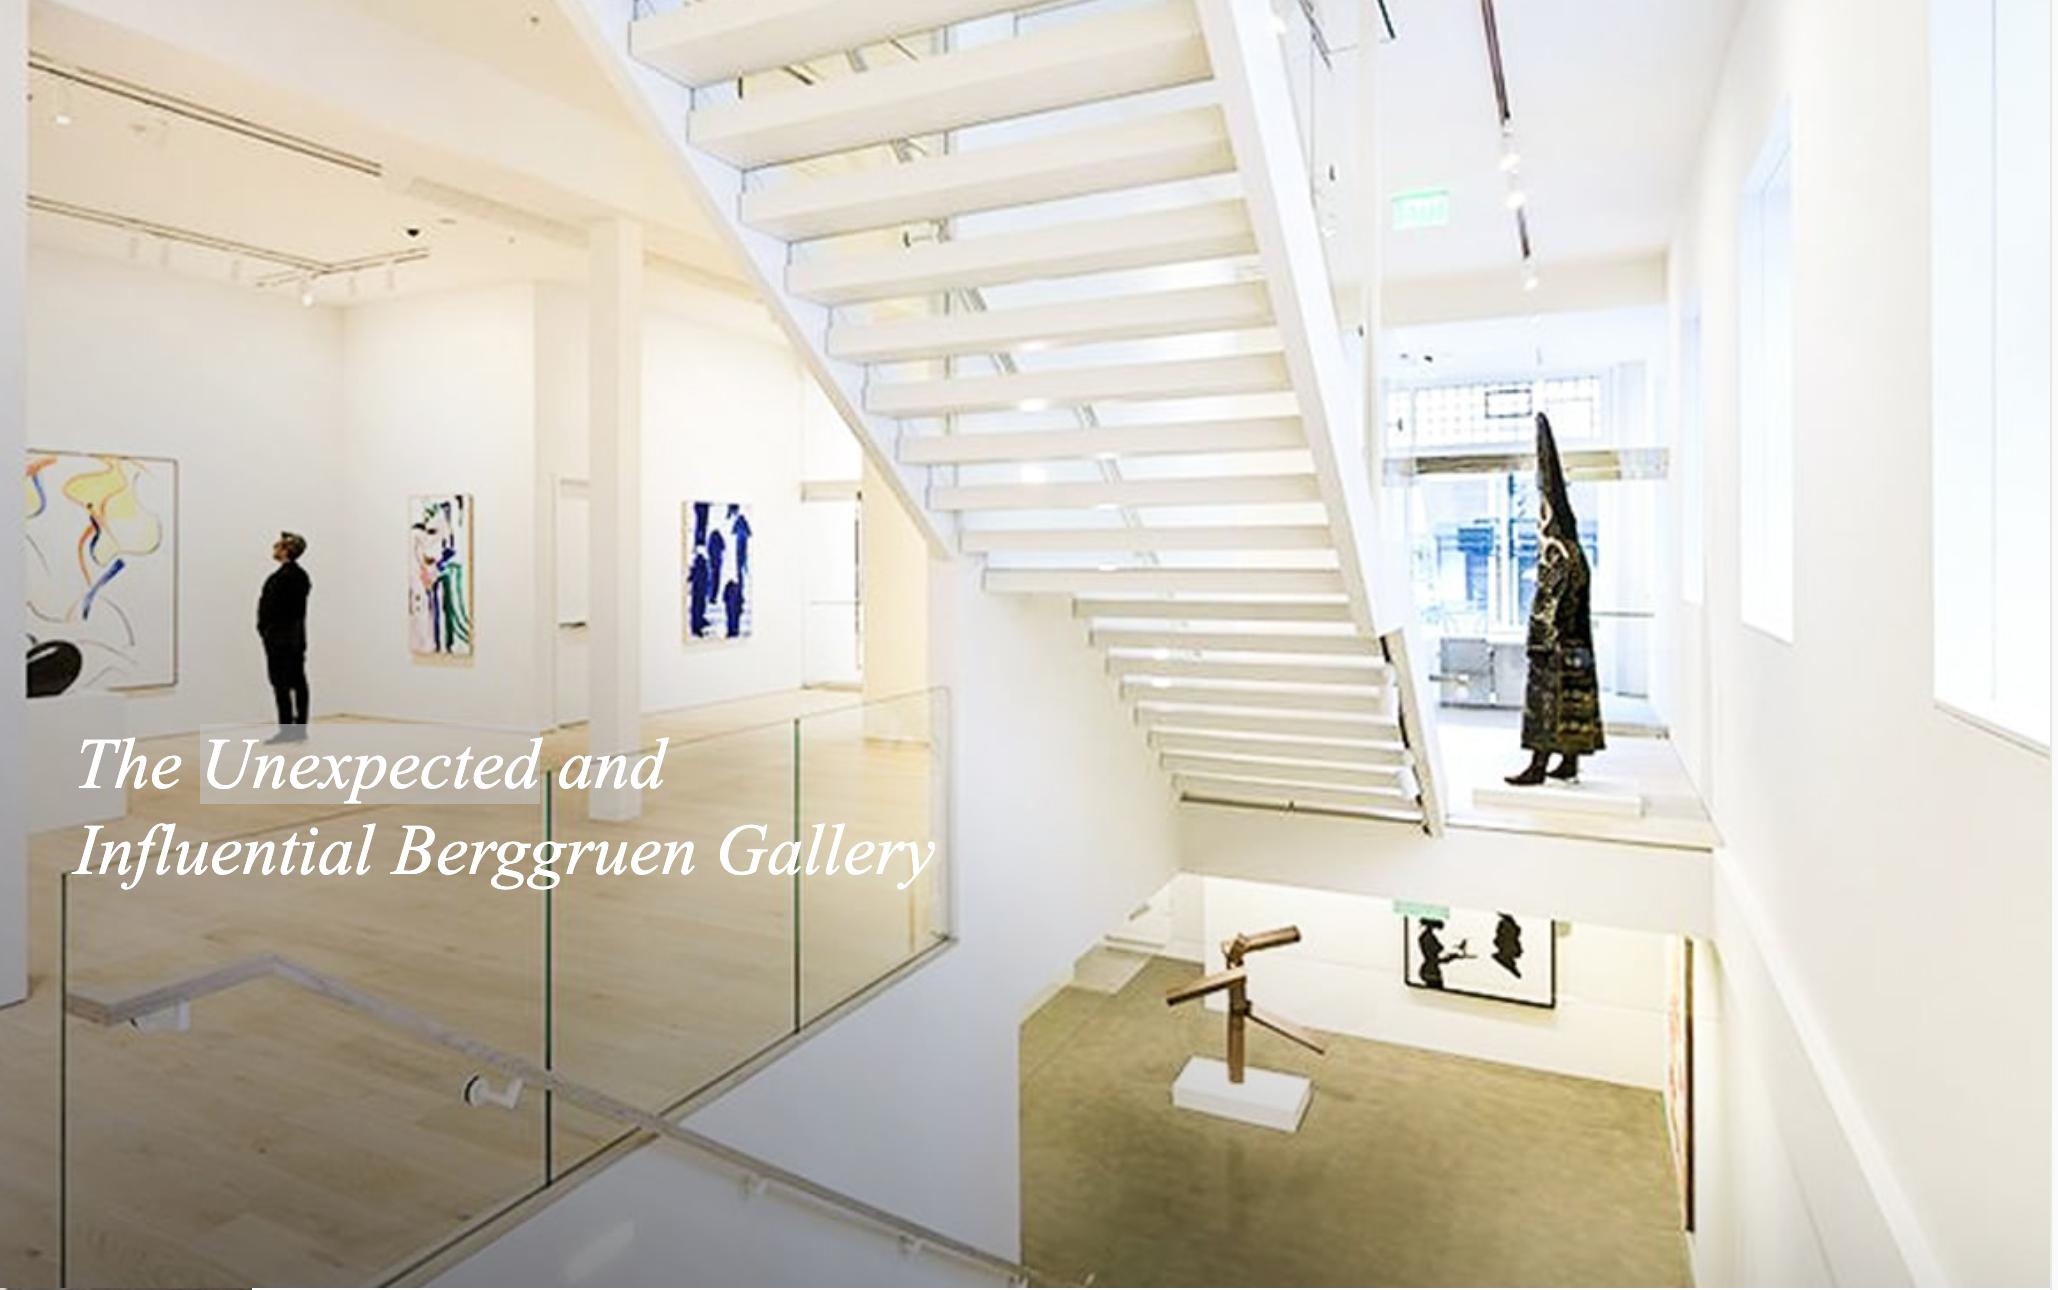 Berggruen Gallery in YBG article